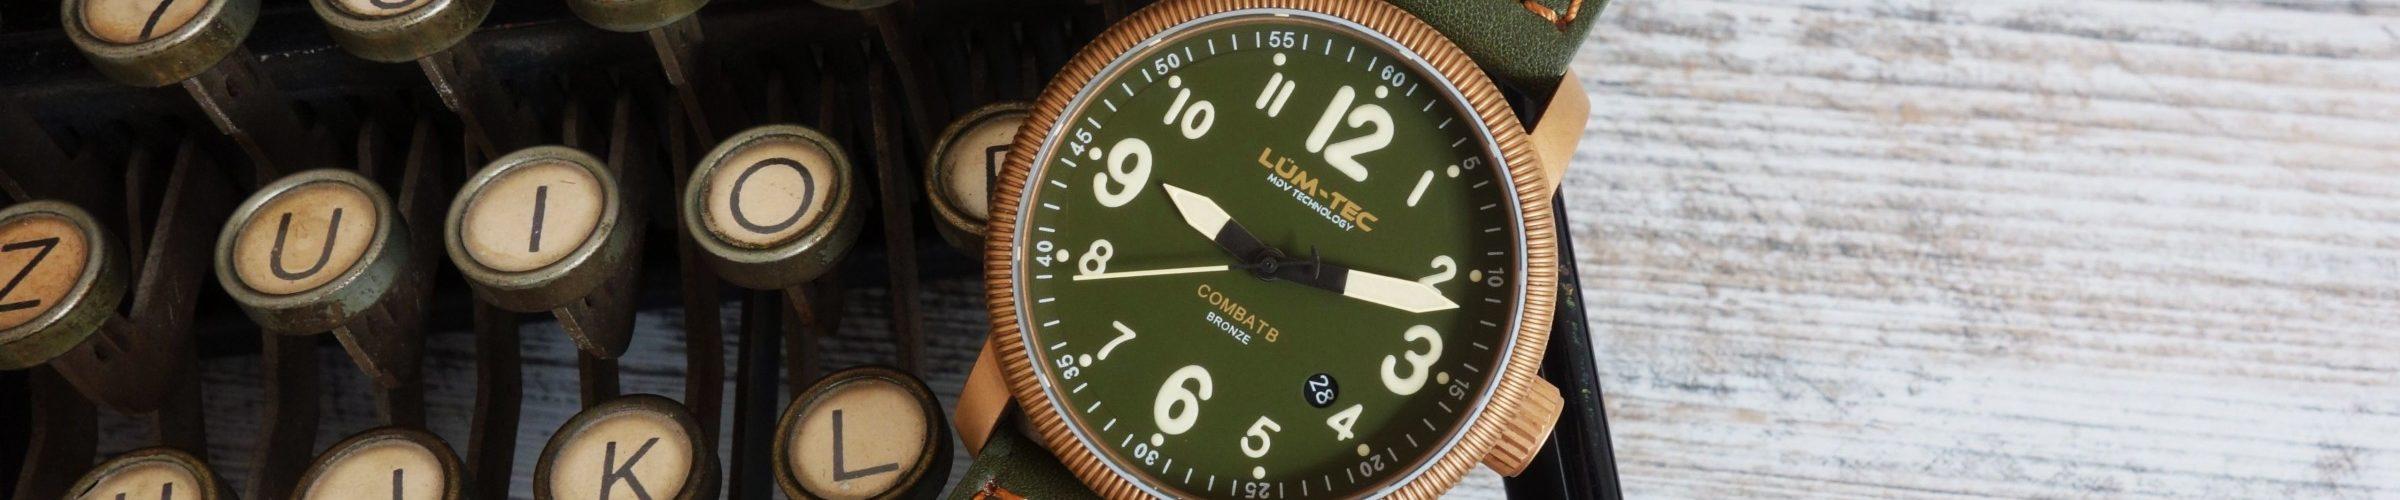 LUM-TEC Bronze Military Uhr mit Vintage-Charme